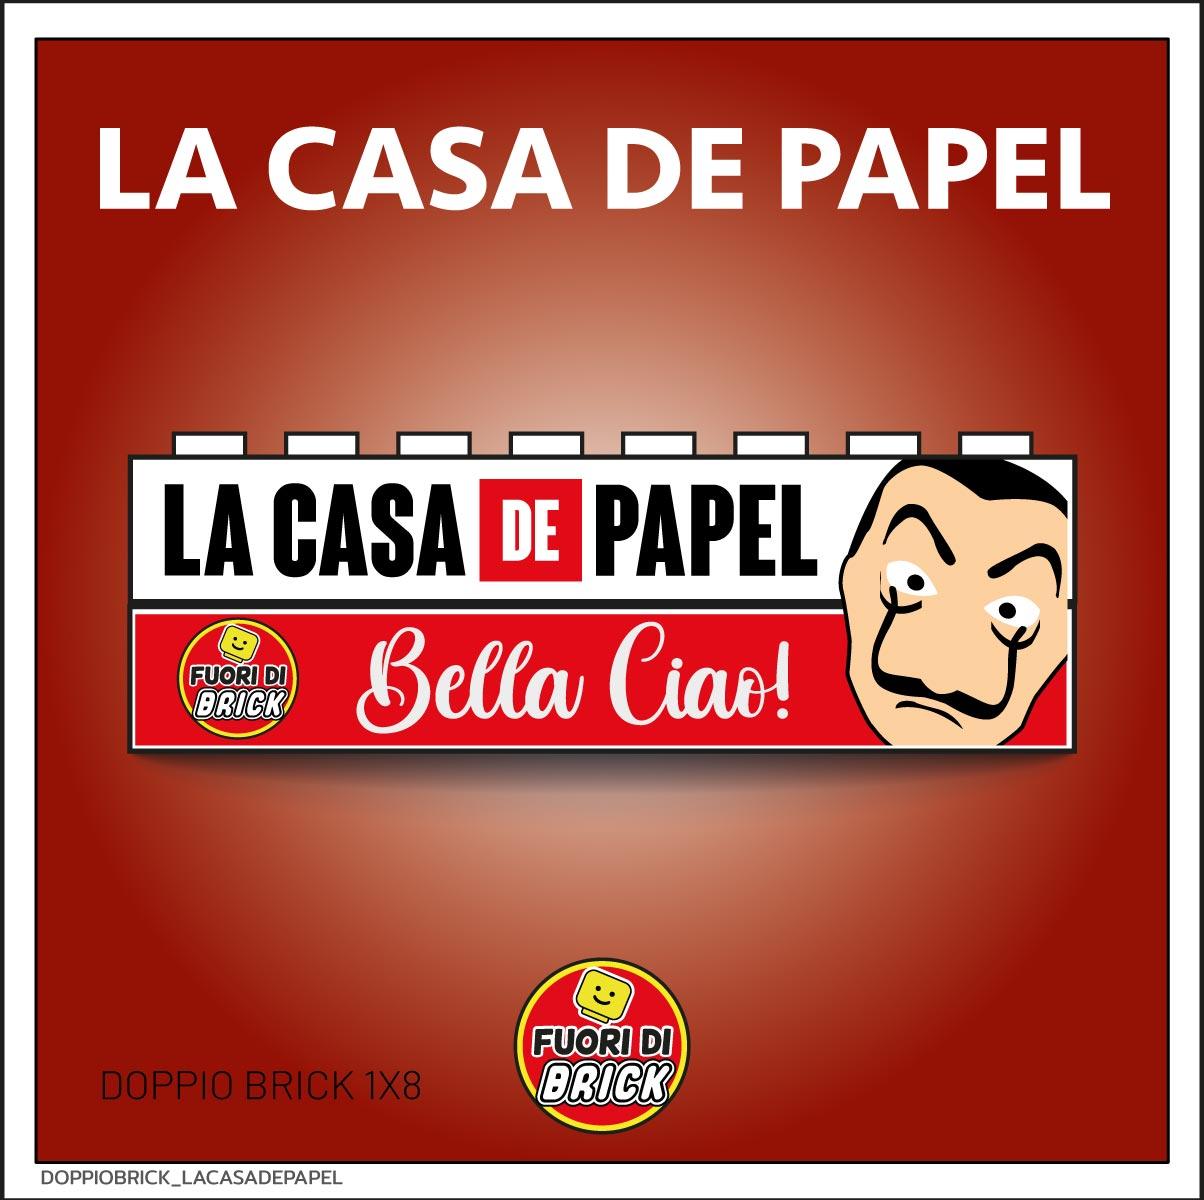 DOPPIO BRICK 1X8_LA CASA DE PAPEL